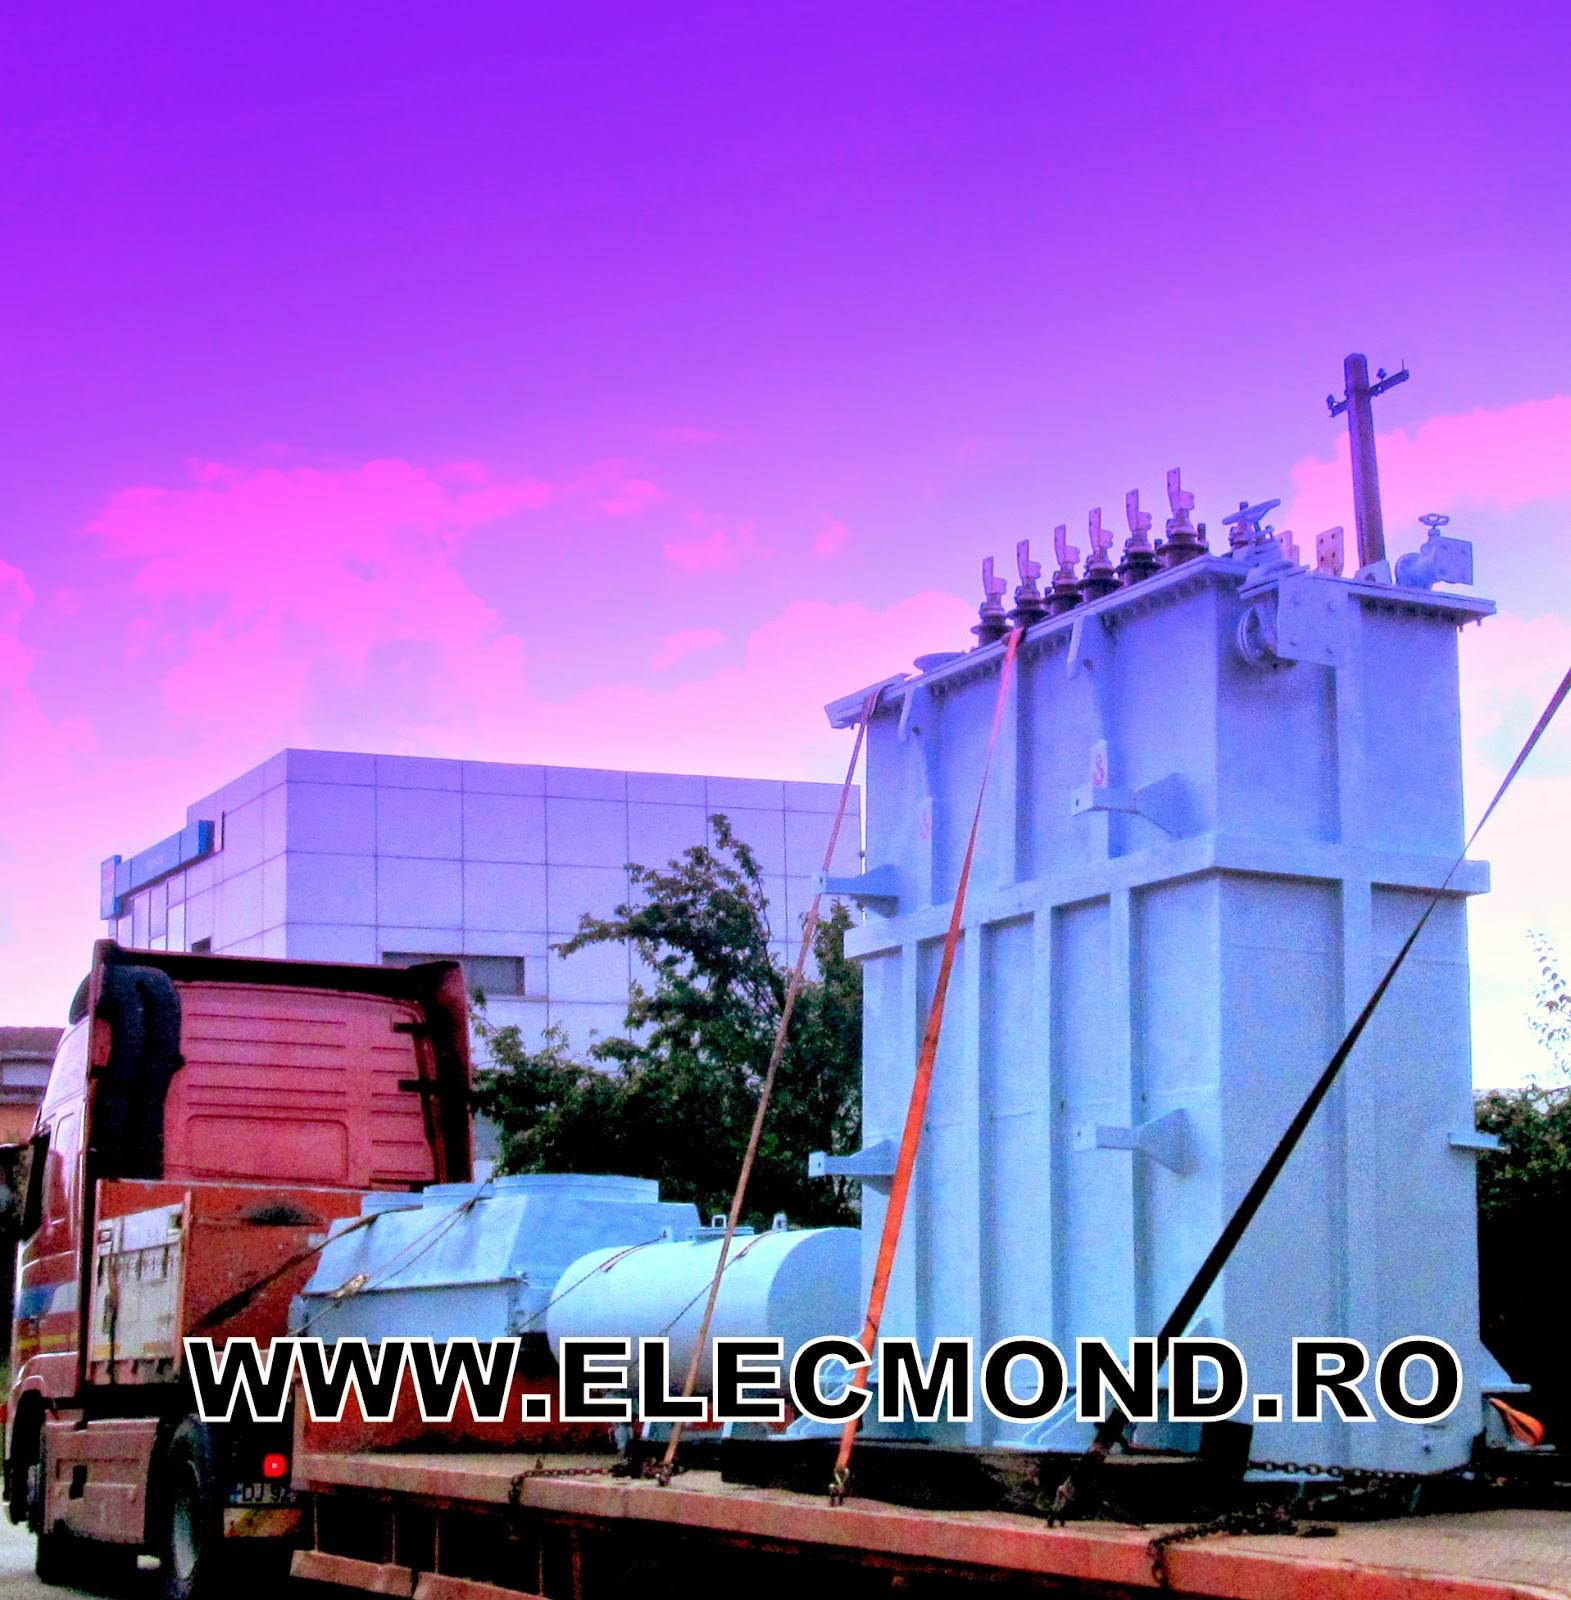 Transformator TTU-Cu- OFAF 9150 kVA 6/0,785 / 0,746/0,707 kV , baterie racire transformator , reparatii transformatoare , transformator de mare putere , transformatoare de putere, elecmond , trafo , transformatoare craiova , transformatoare carcea , transformatoare bucuresti , transformatoare satu mare , transformatoare bucuresti , transformatoare iasi, transformatoare calarasi , transformatoare constanta